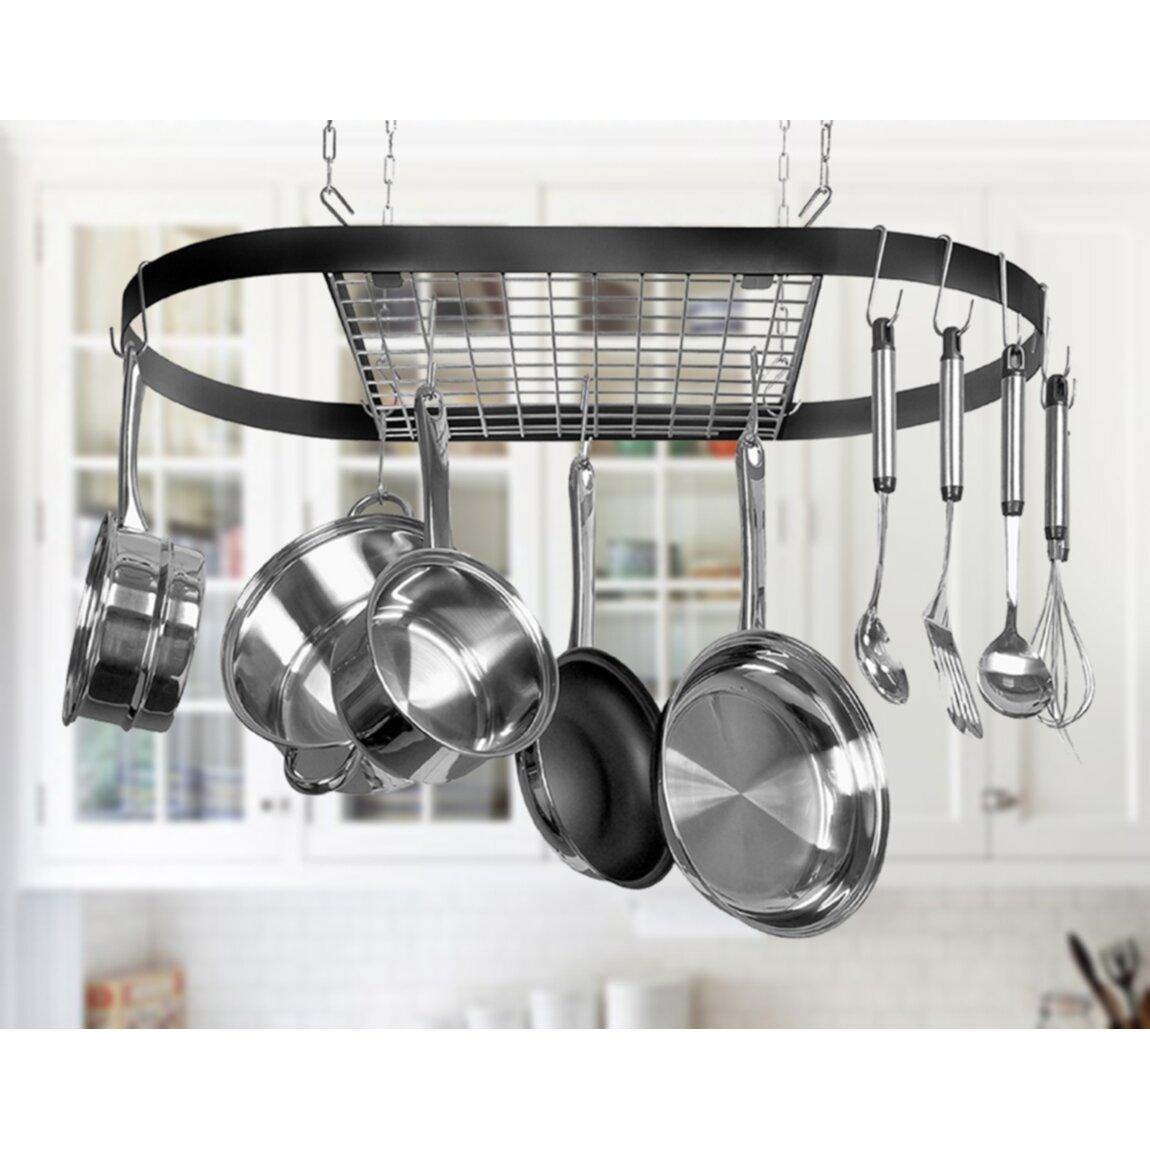 Pot Rack: Kinetic Classicor Wrought-Iron Hanging Oval Pot Rack